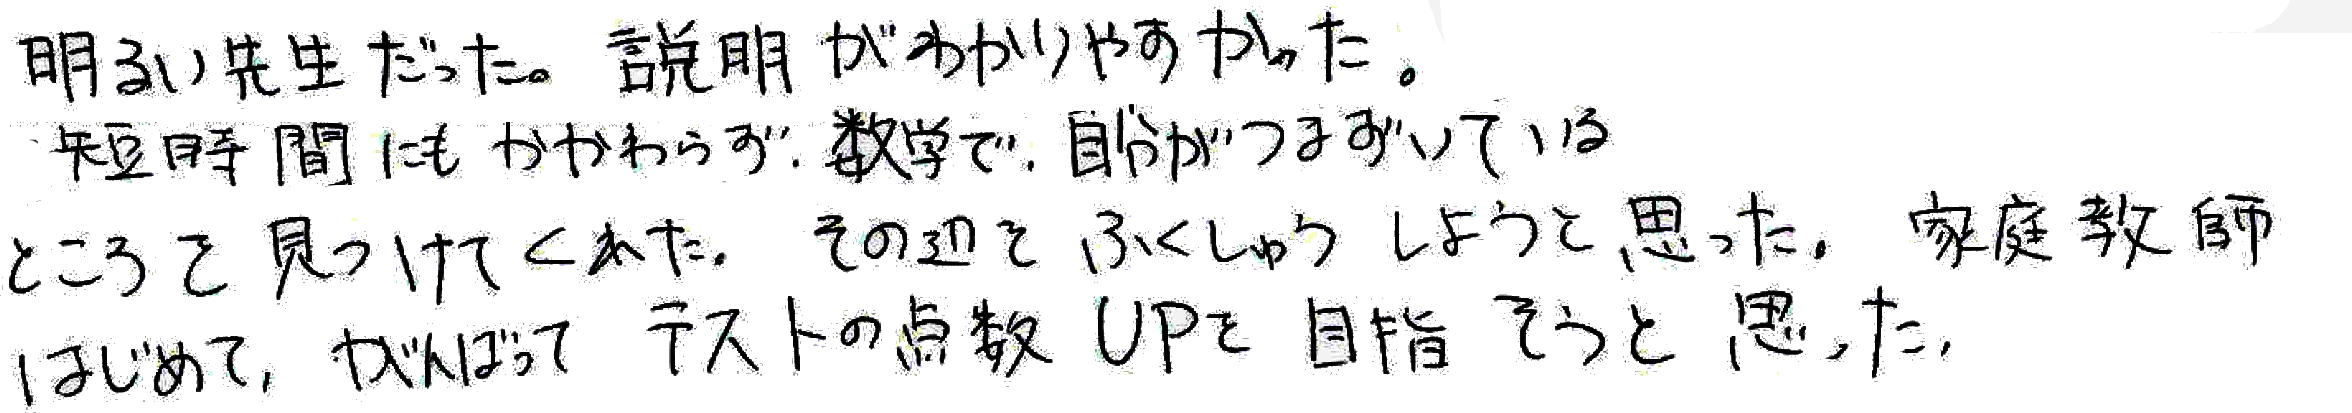 Cちゃん(揖保郡太子町)からの口コミ